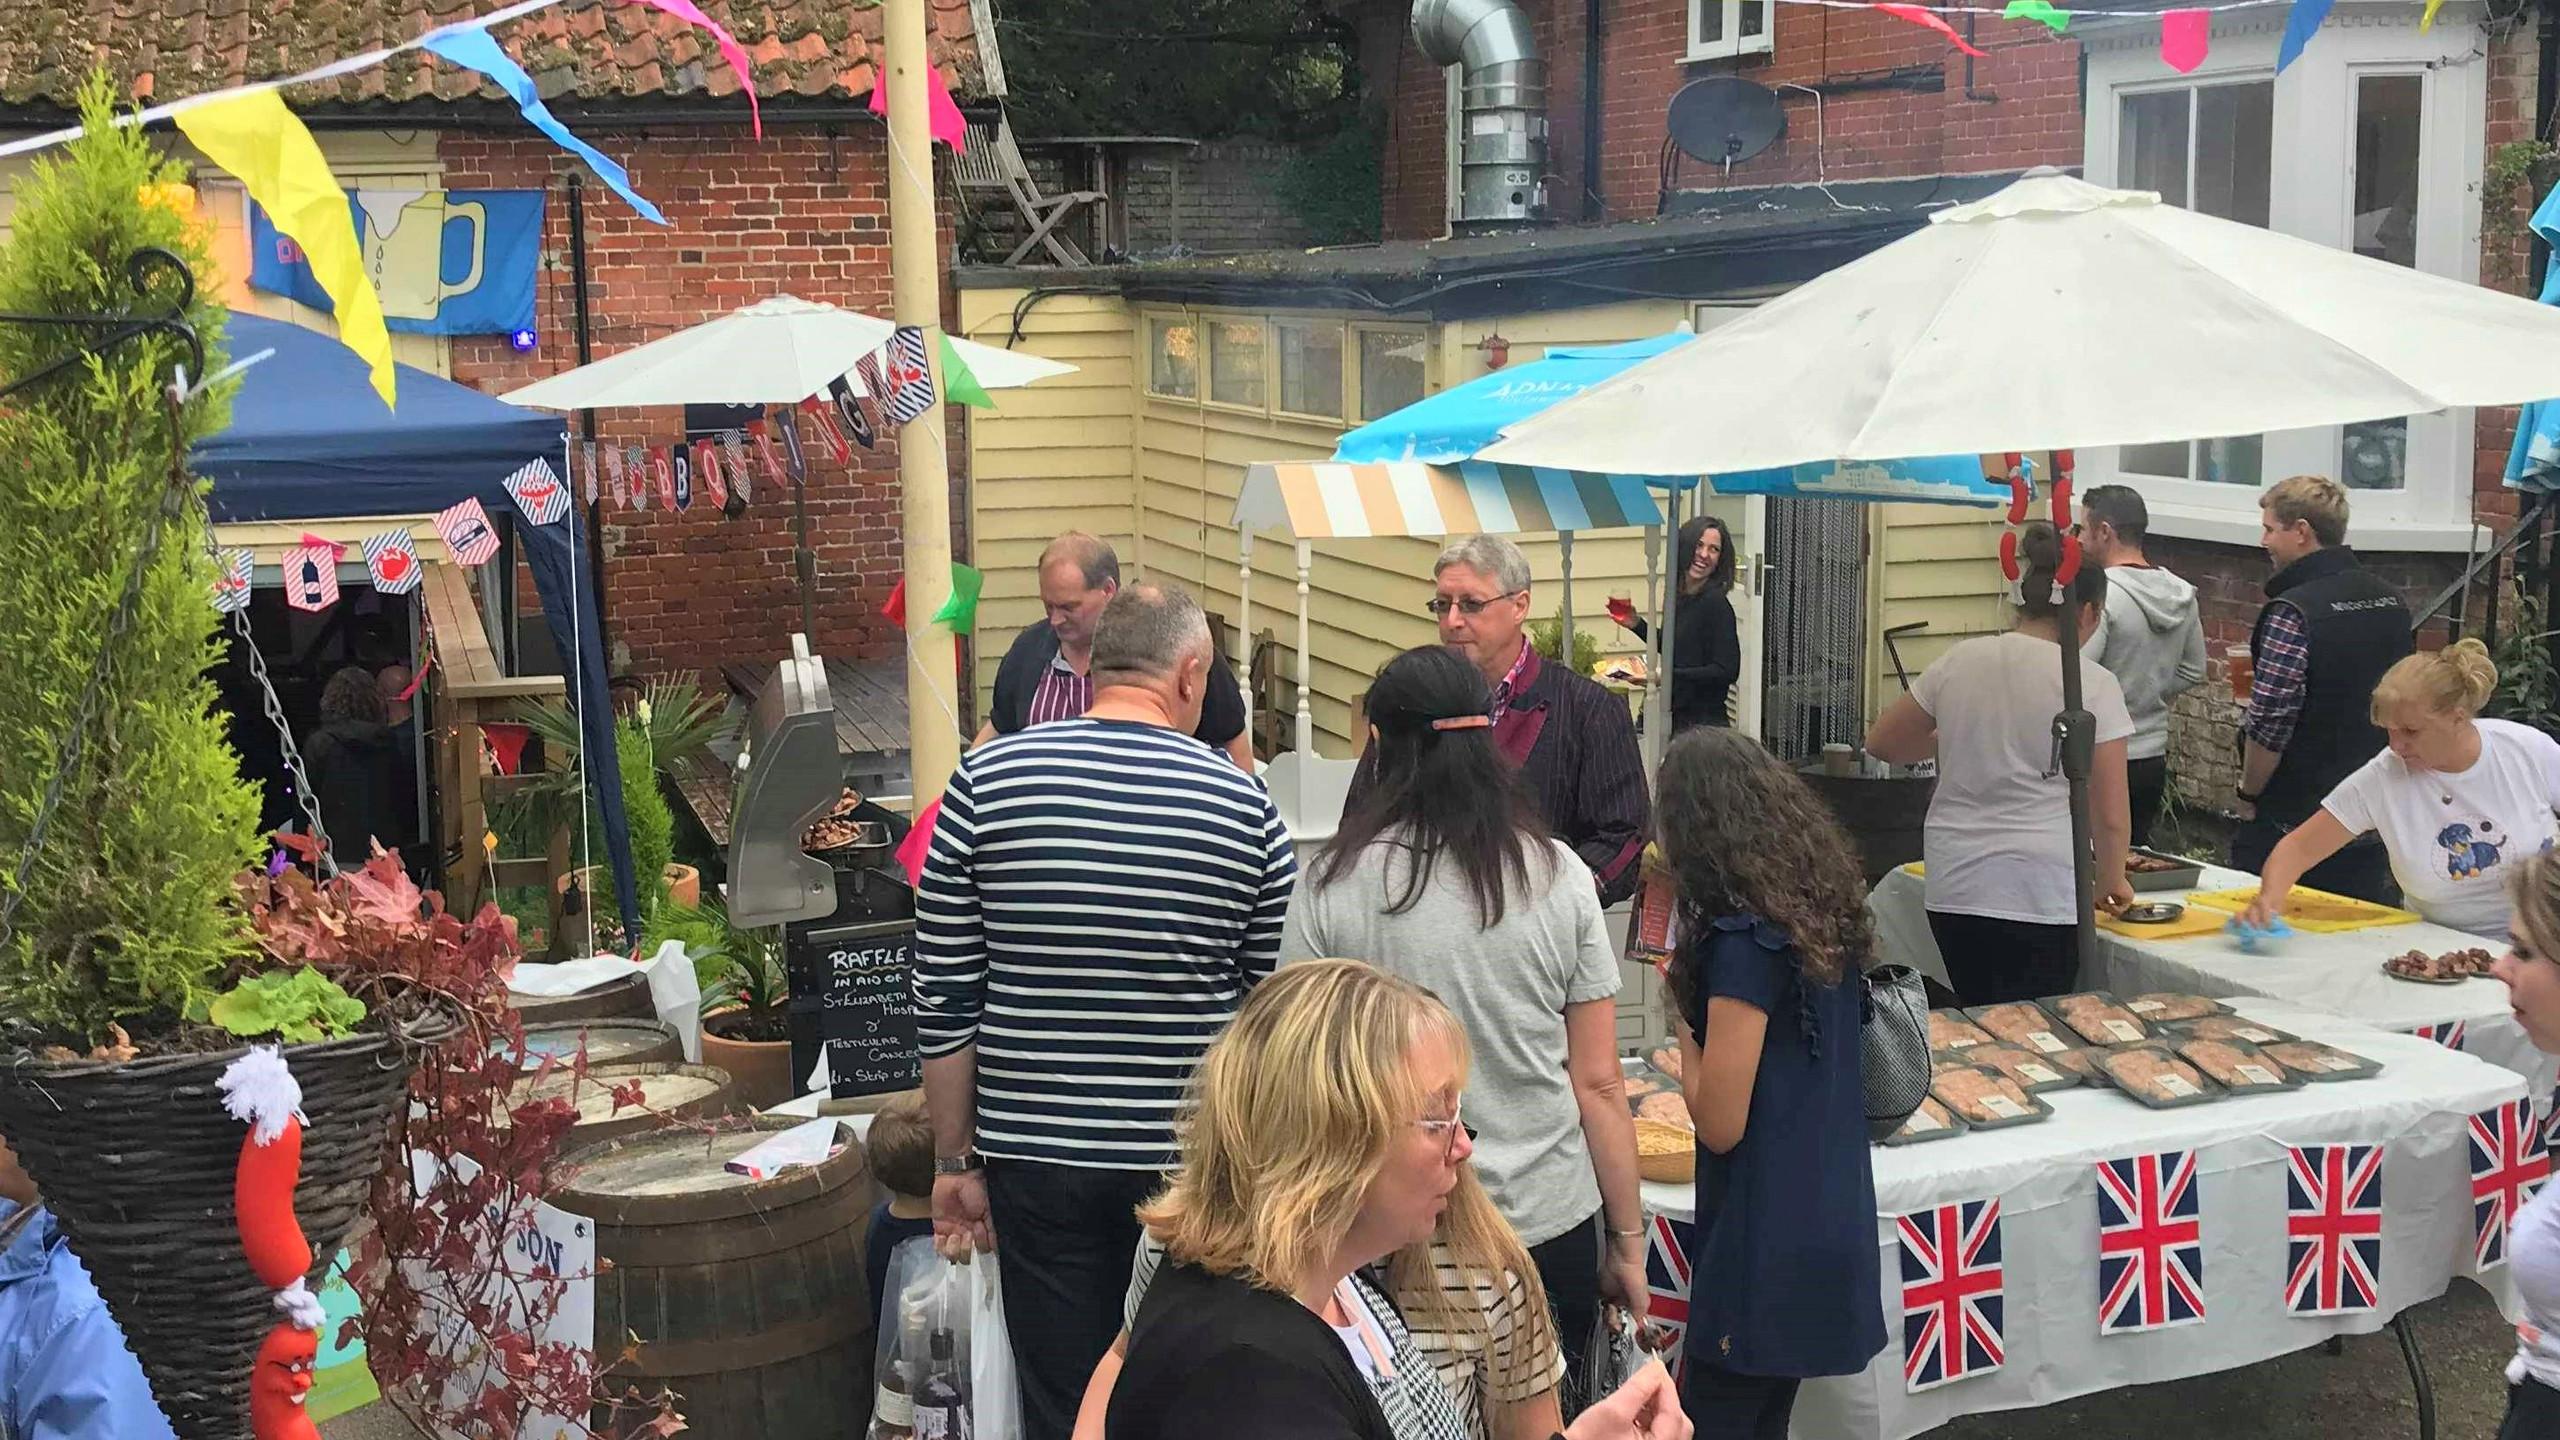 Popular at the Framlingham Sausage Festi